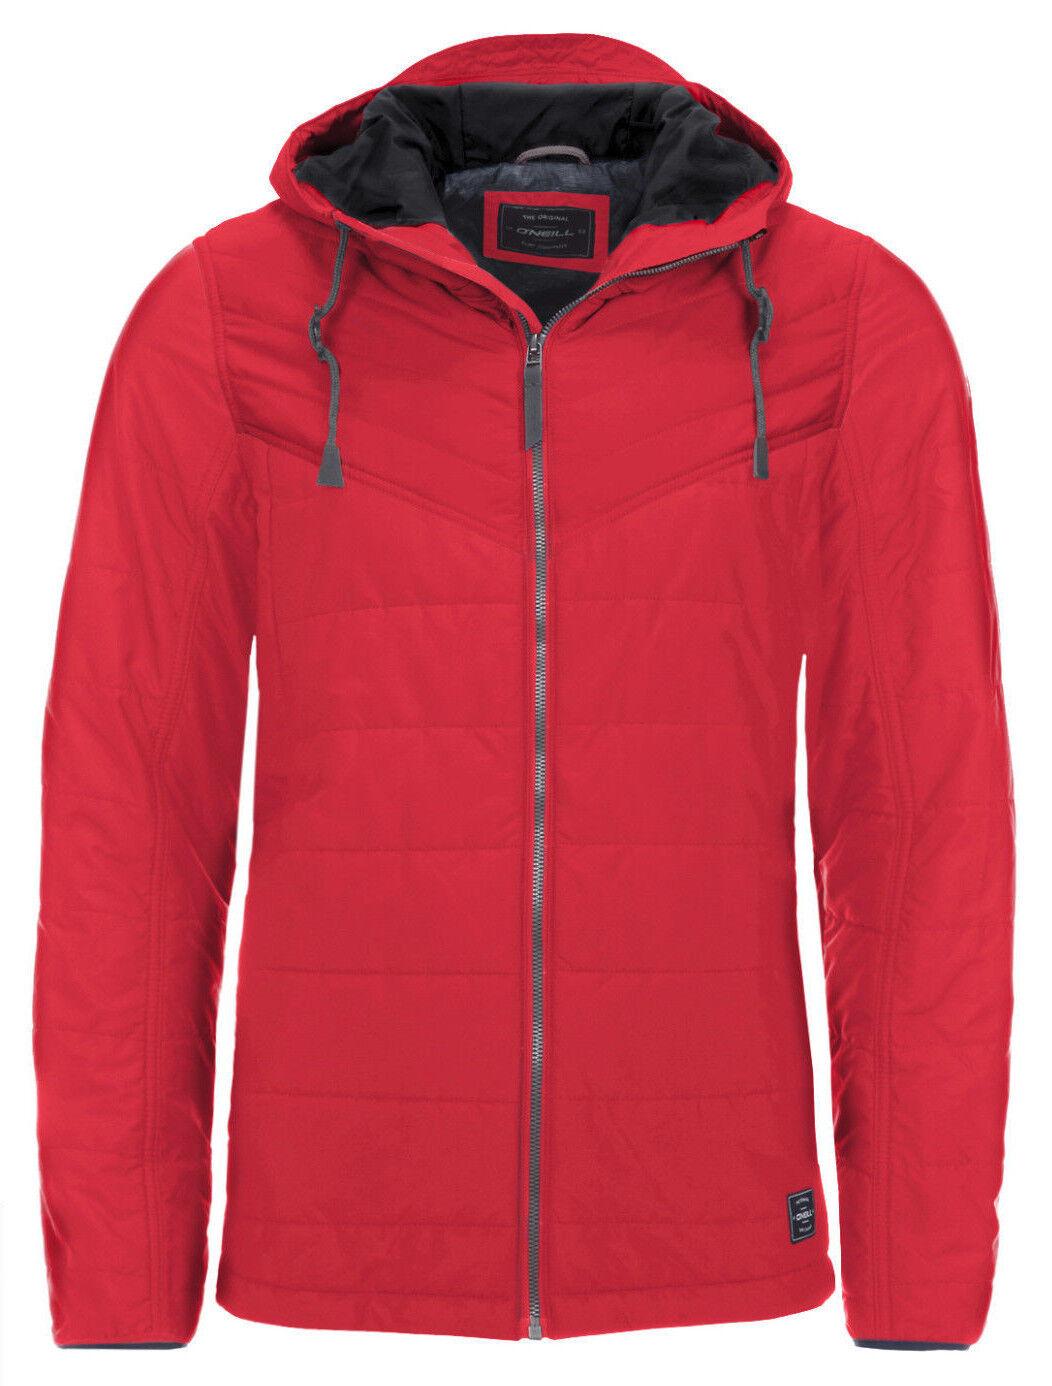 Veste O 'neill Loisirs Transit Hommes D'hiver Jacket 41Xq4